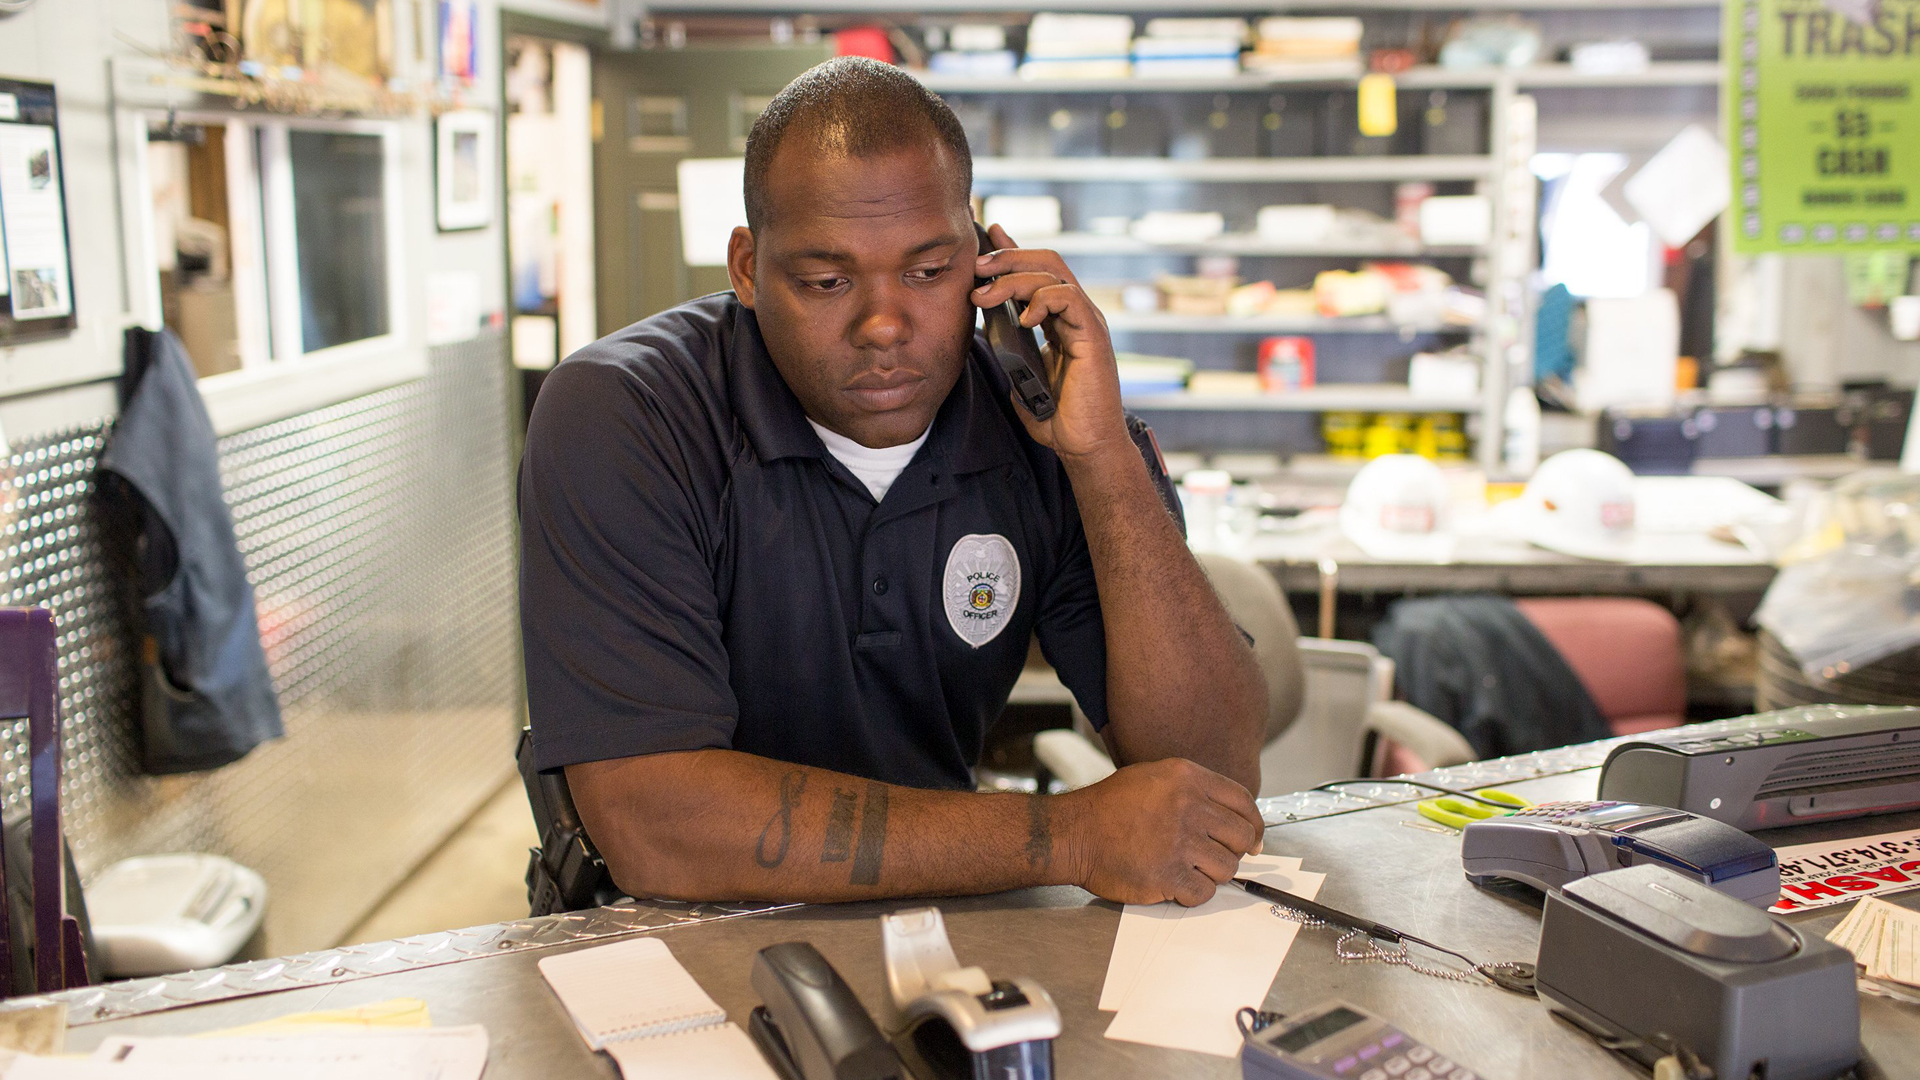 Police Pay Gap: Many of America's Finest Struggle on Poverty Wages